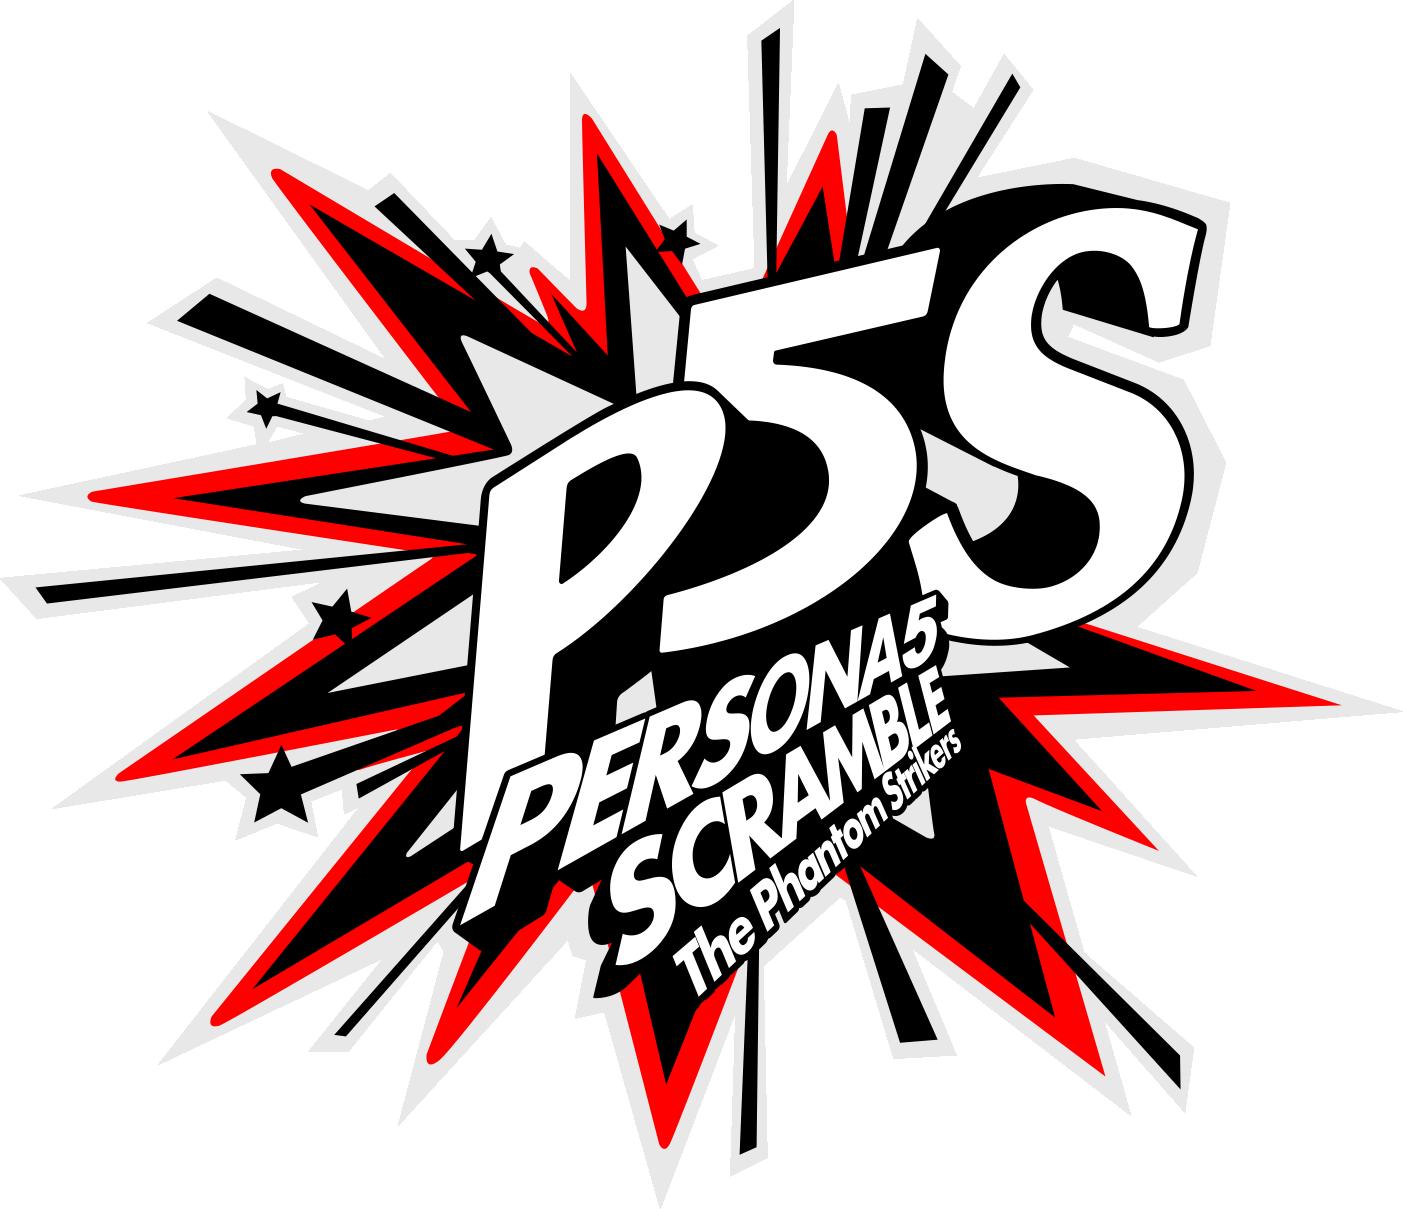 Persona 5 Scramble The Phantom Strikers Megami Tensei Wiki Fandom